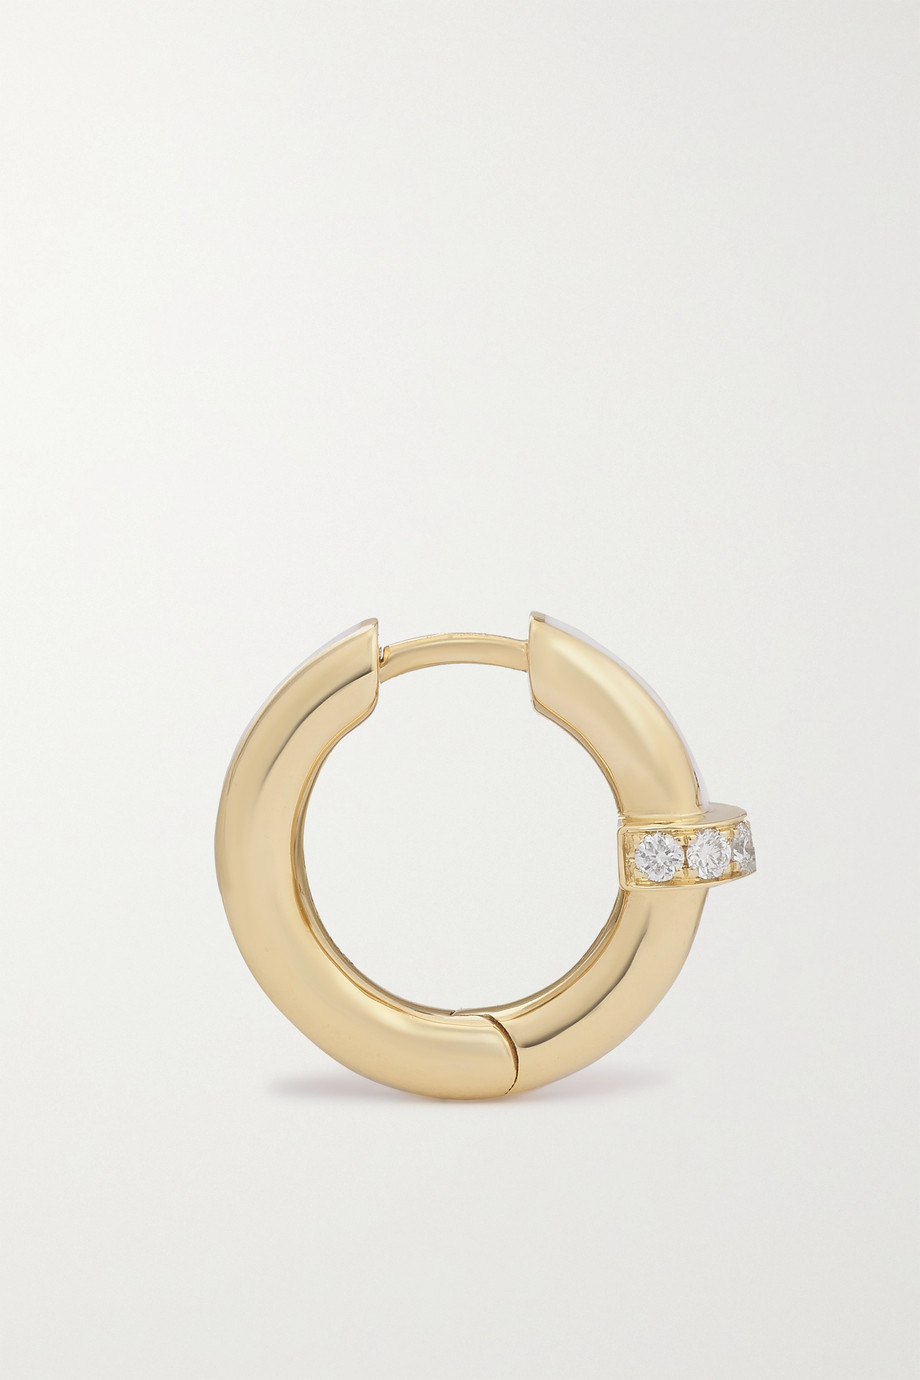 State Property Idris Minor 18-karat gold, enamel and diamond hoop earrings